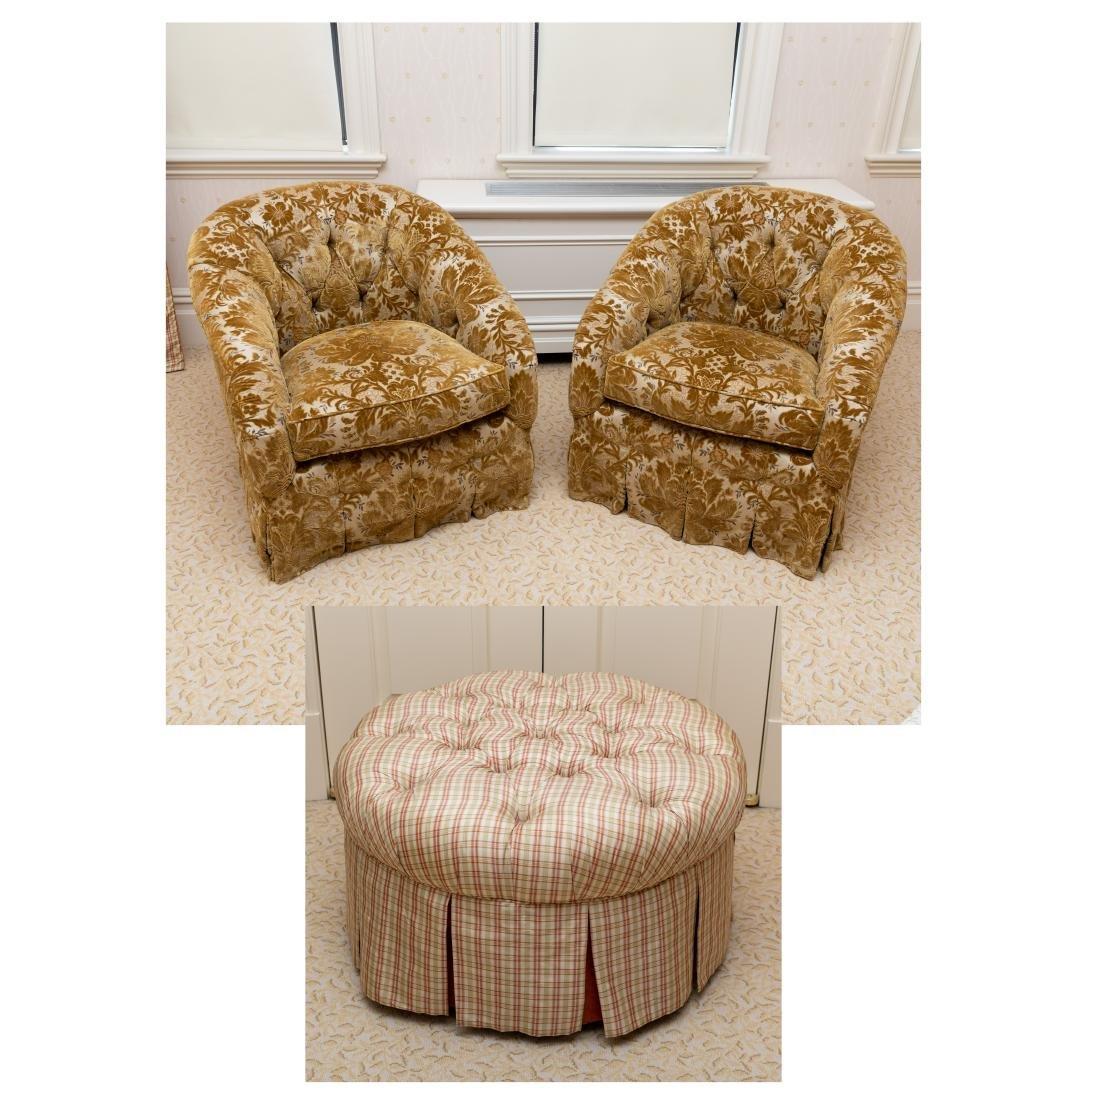 Edward Farrell - Chairs & Tufted Ottoman